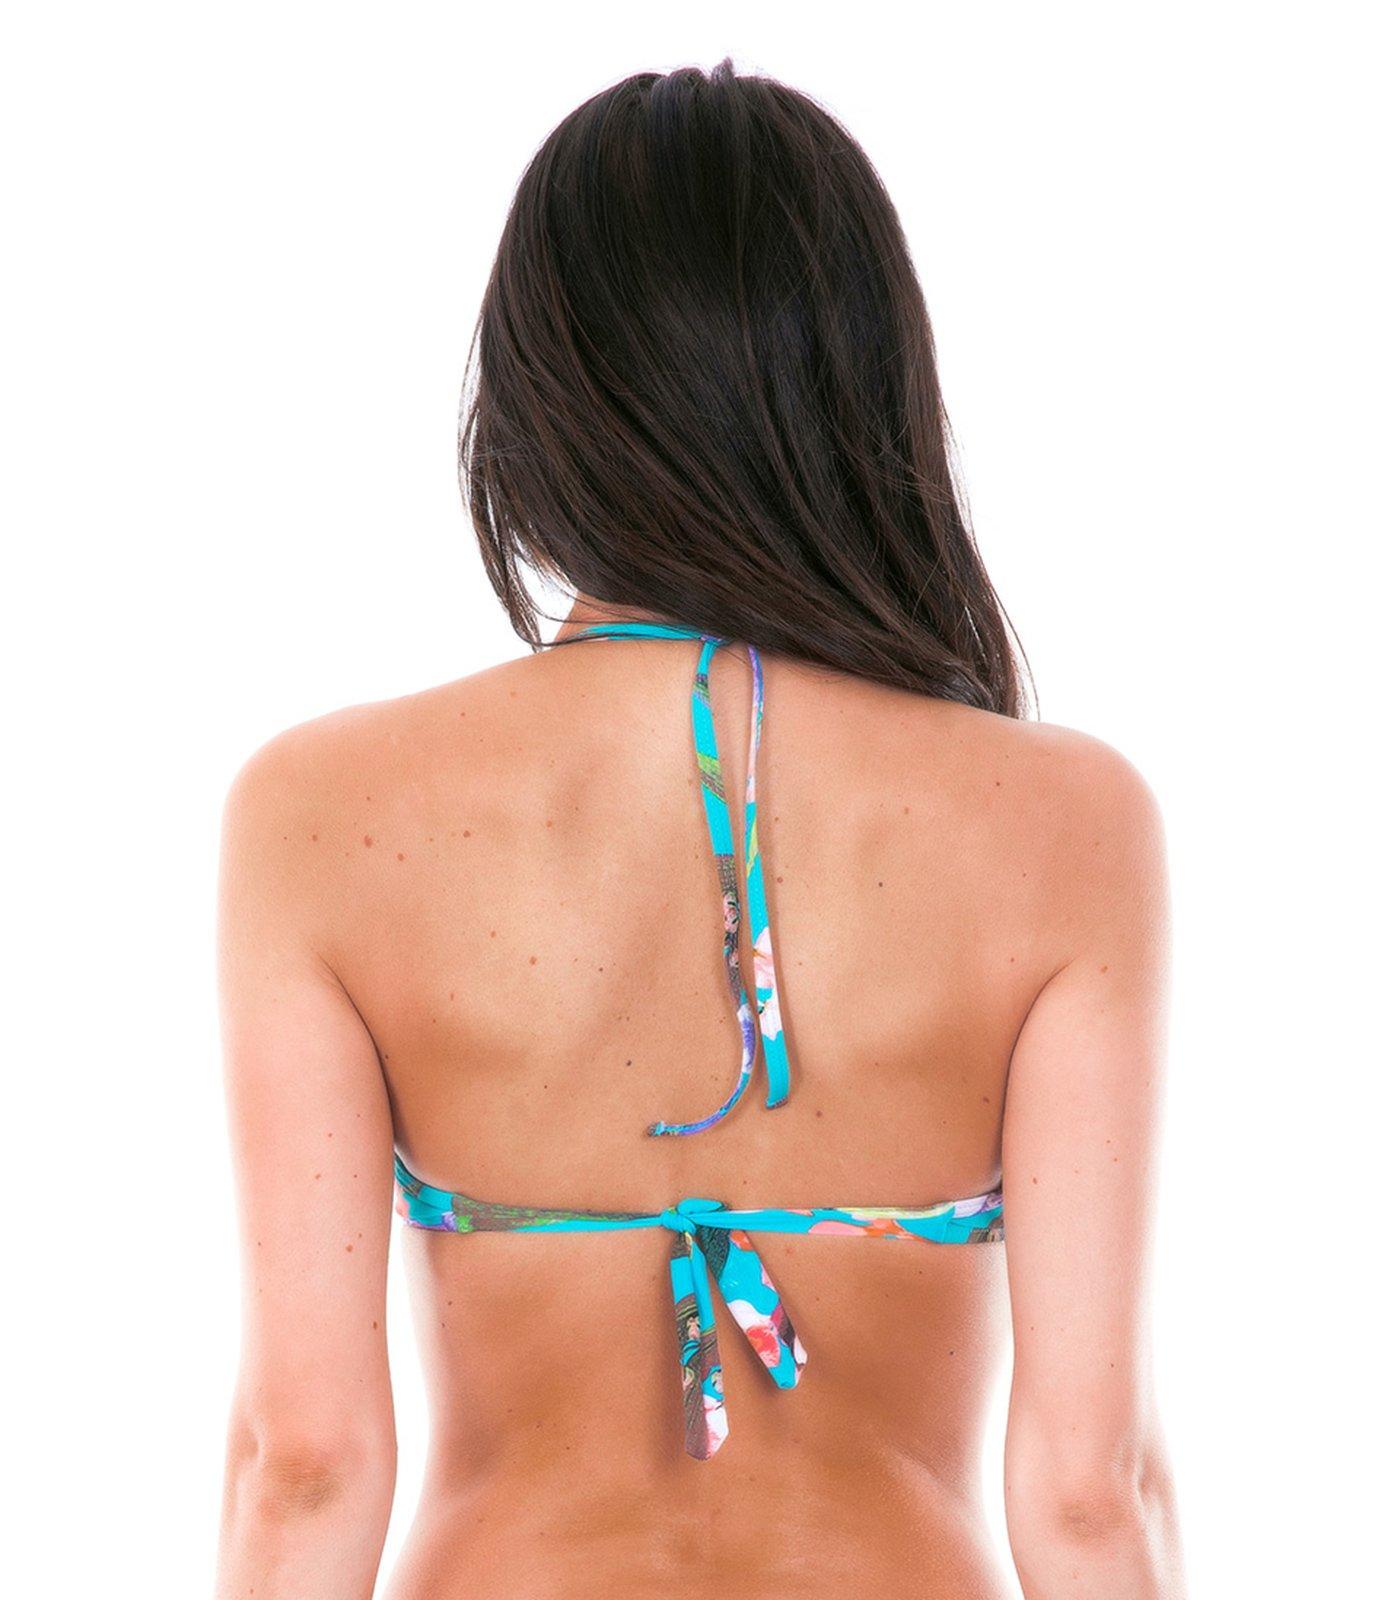 push up bikini oberteil farbe blau mit blumenmotiven. Black Bedroom Furniture Sets. Home Design Ideas